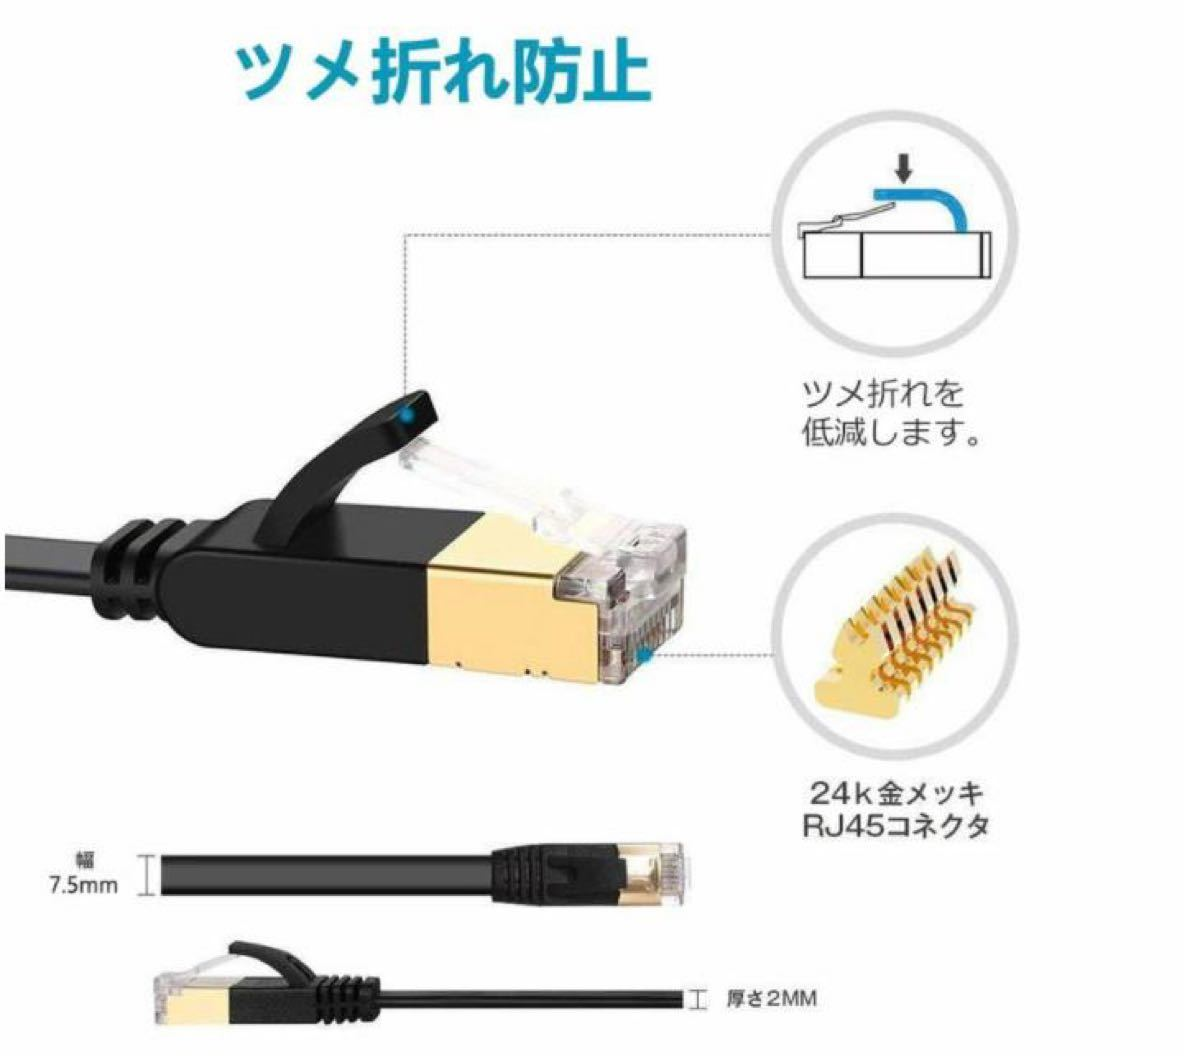 LANケーブル CAT8 5m RJ45 40ギガビット 高速光通信対応